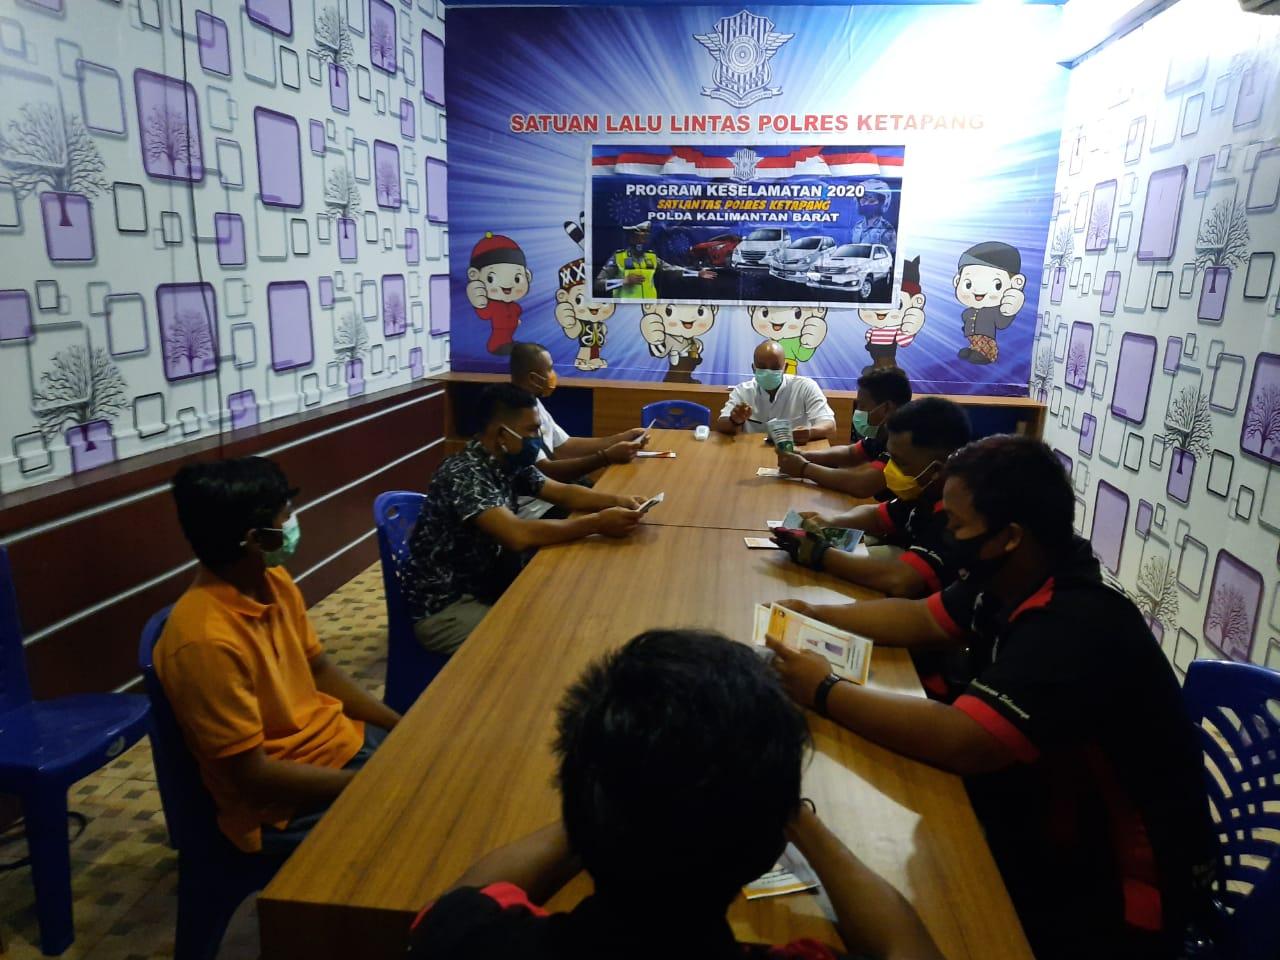 Satlantas Polres Ketapang Berikan Himbauan Untuk Tidak Mudik